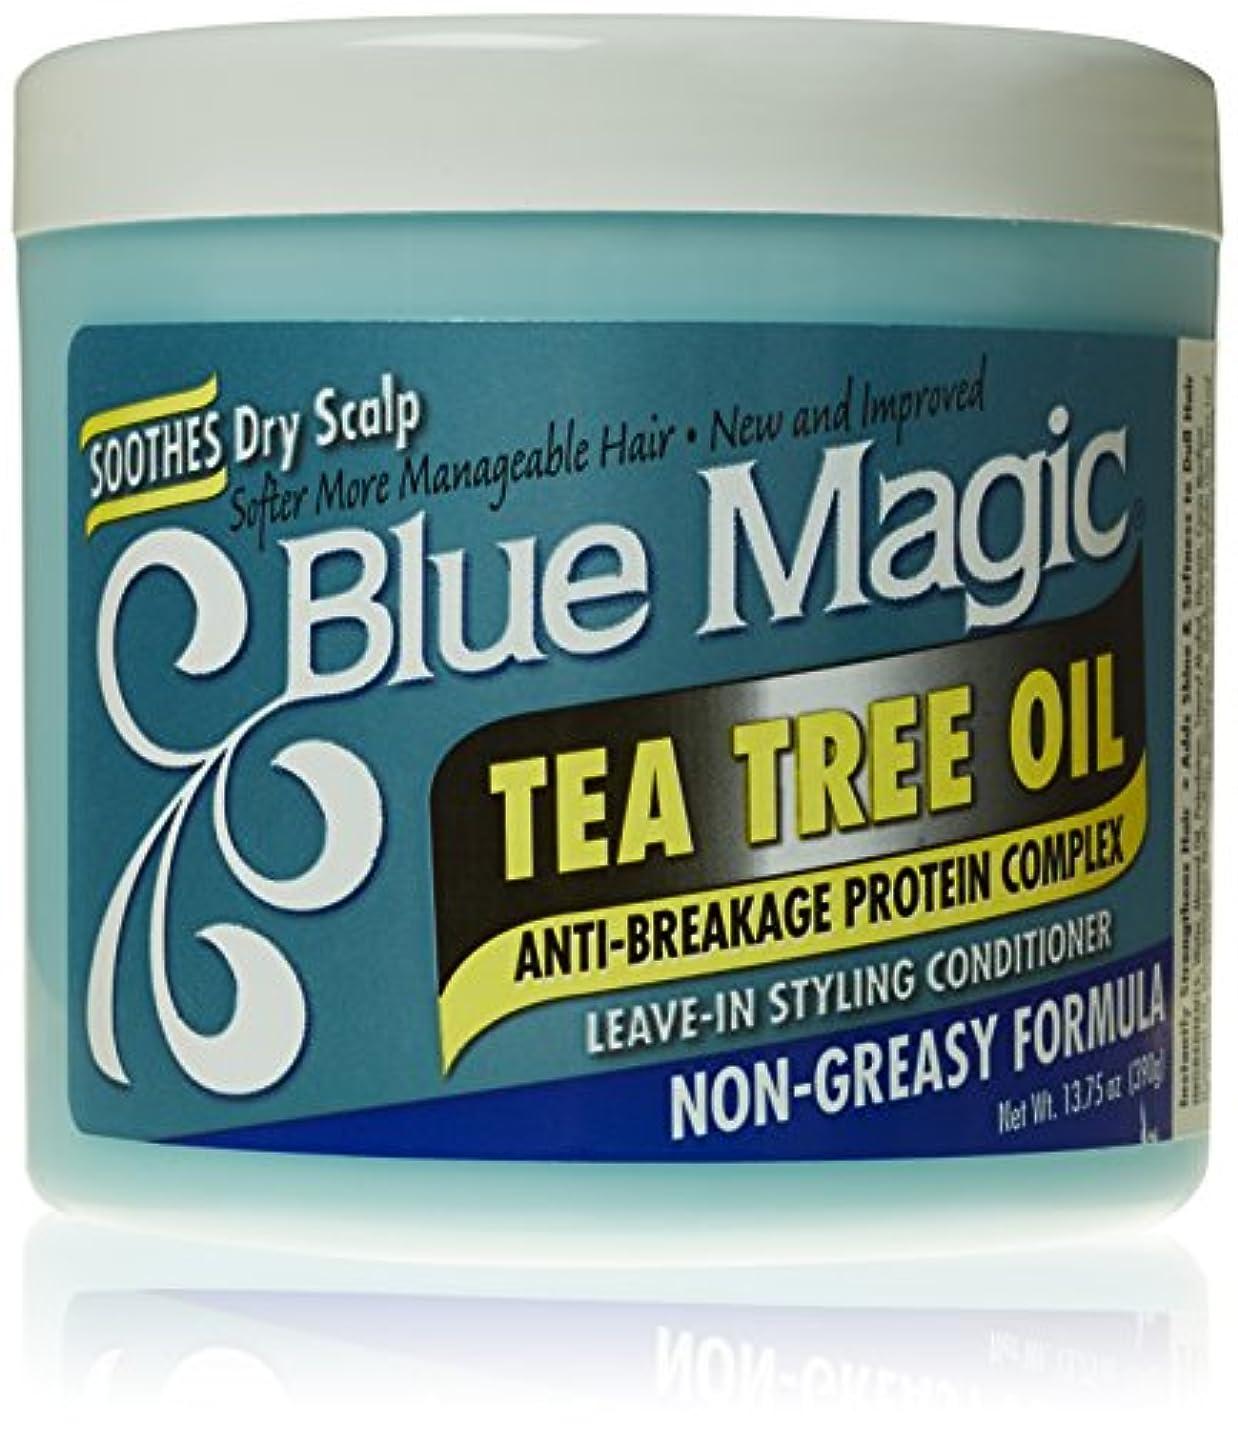 Blue Magic ティーツリーは、リーブインヘアスタイリングコンディショナー、13.75オンス